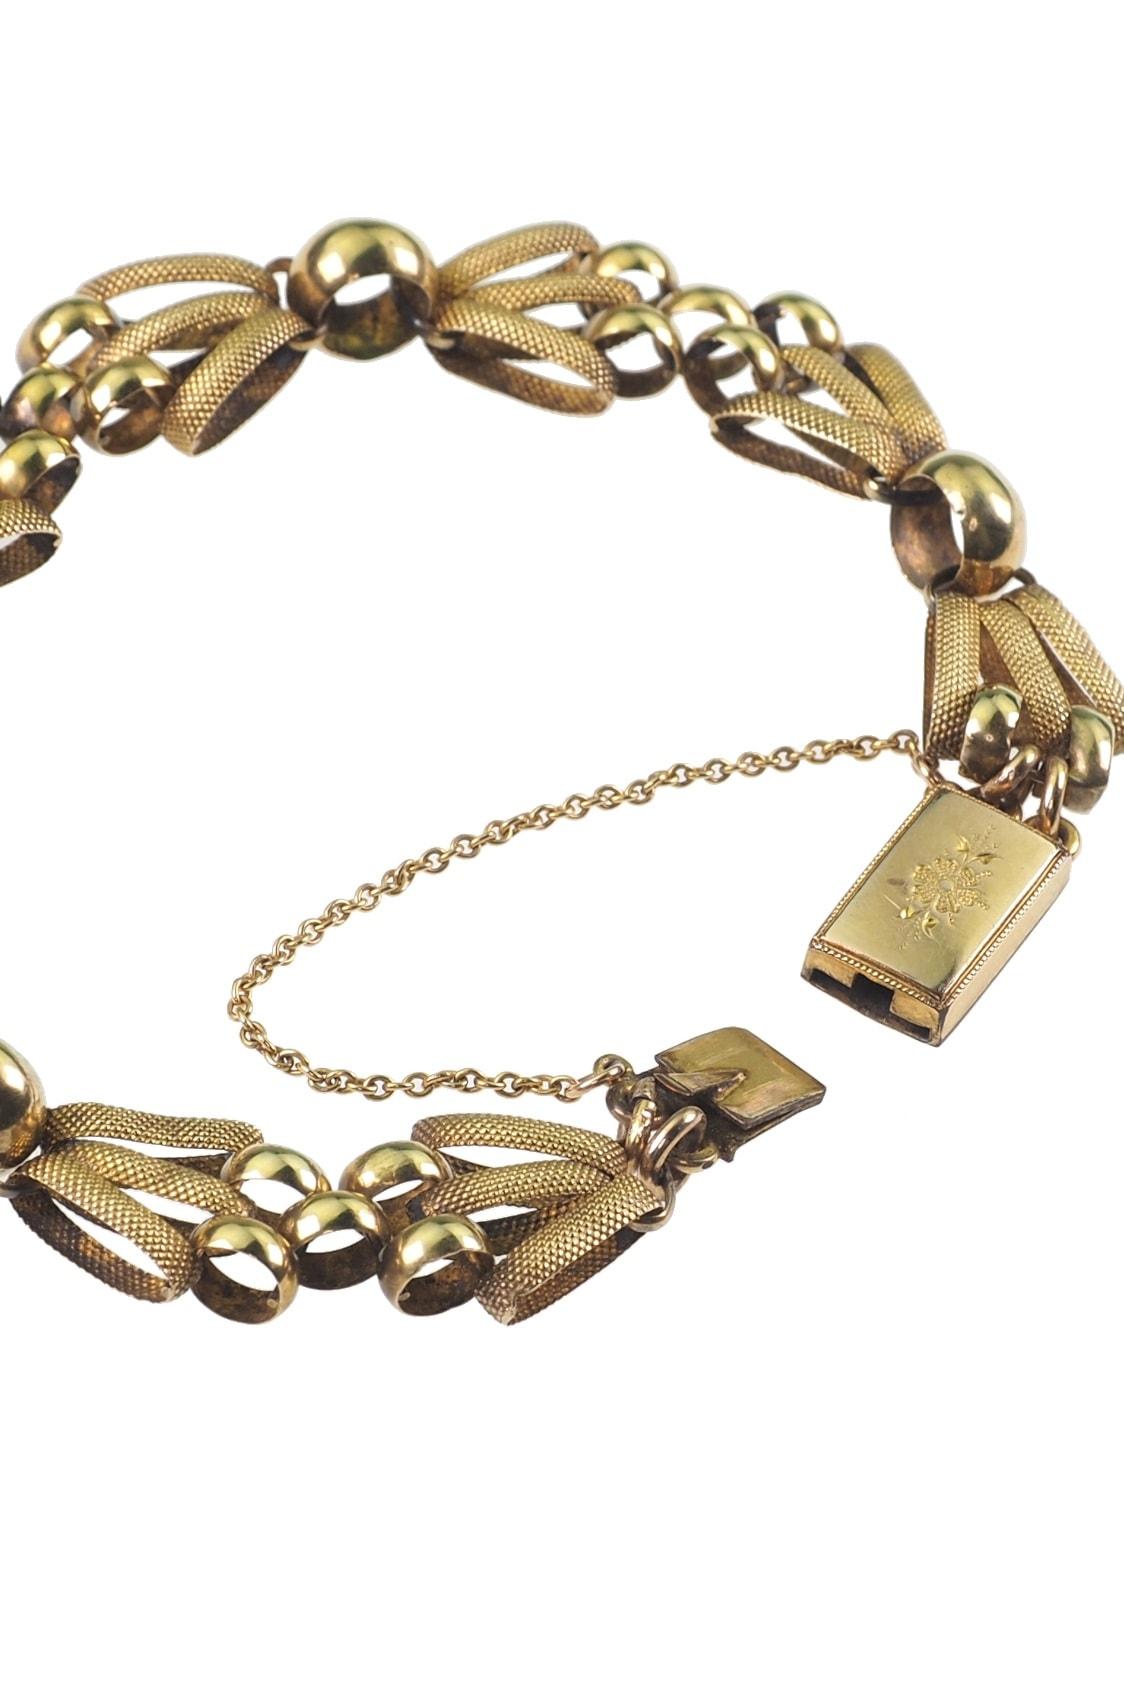 antikes-Gelbgoldarmband-kaufen-2839b